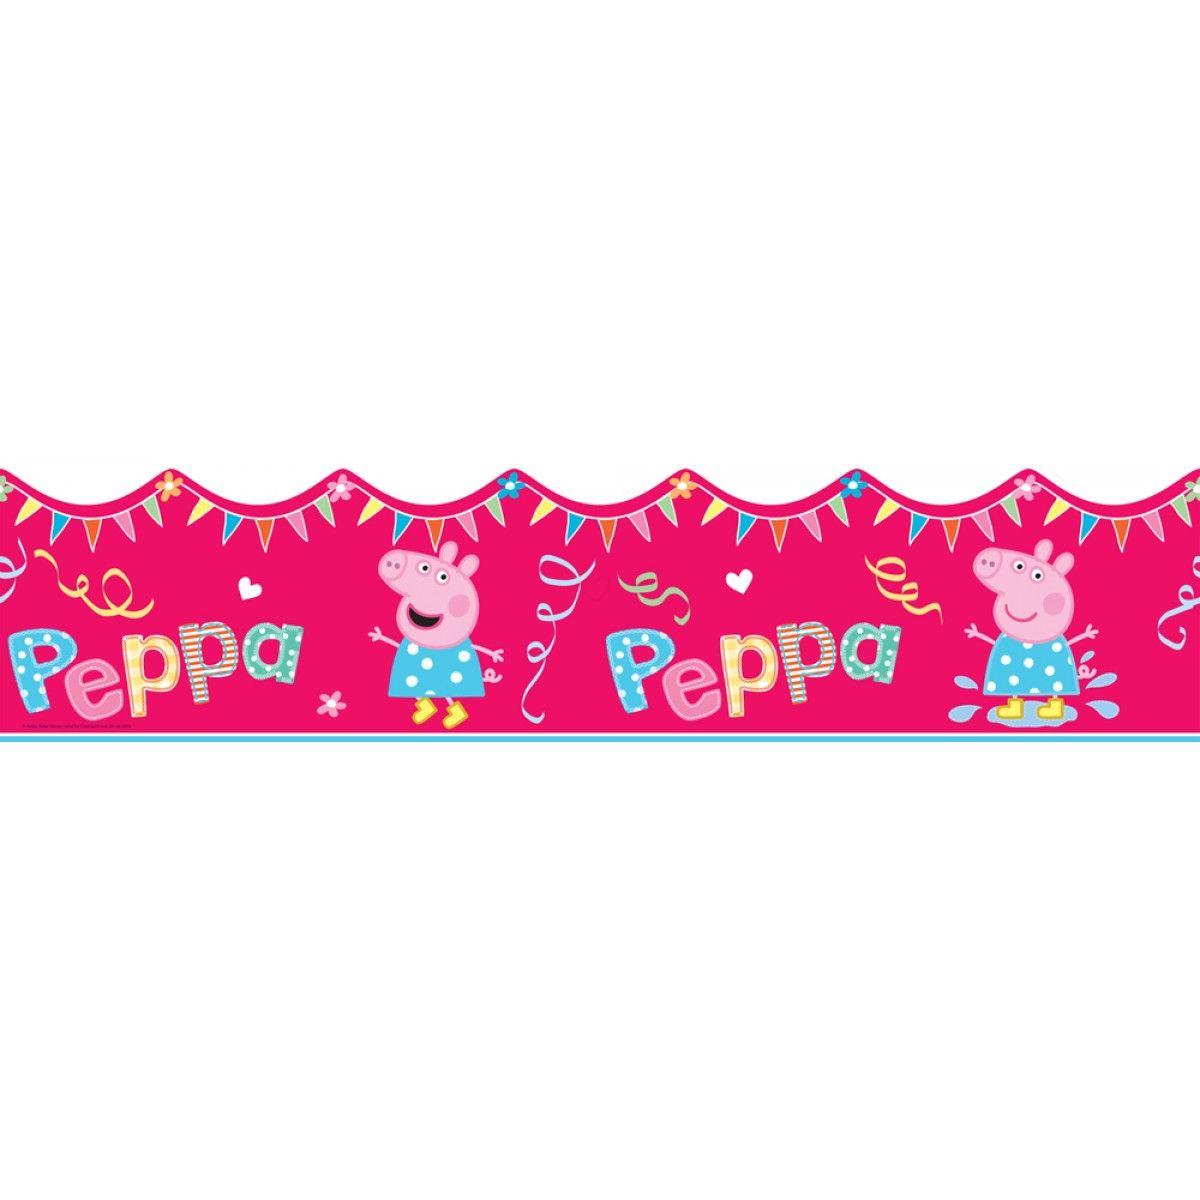 Peppa Pig Shaped Self Adhesive Wallpaper Border 5m